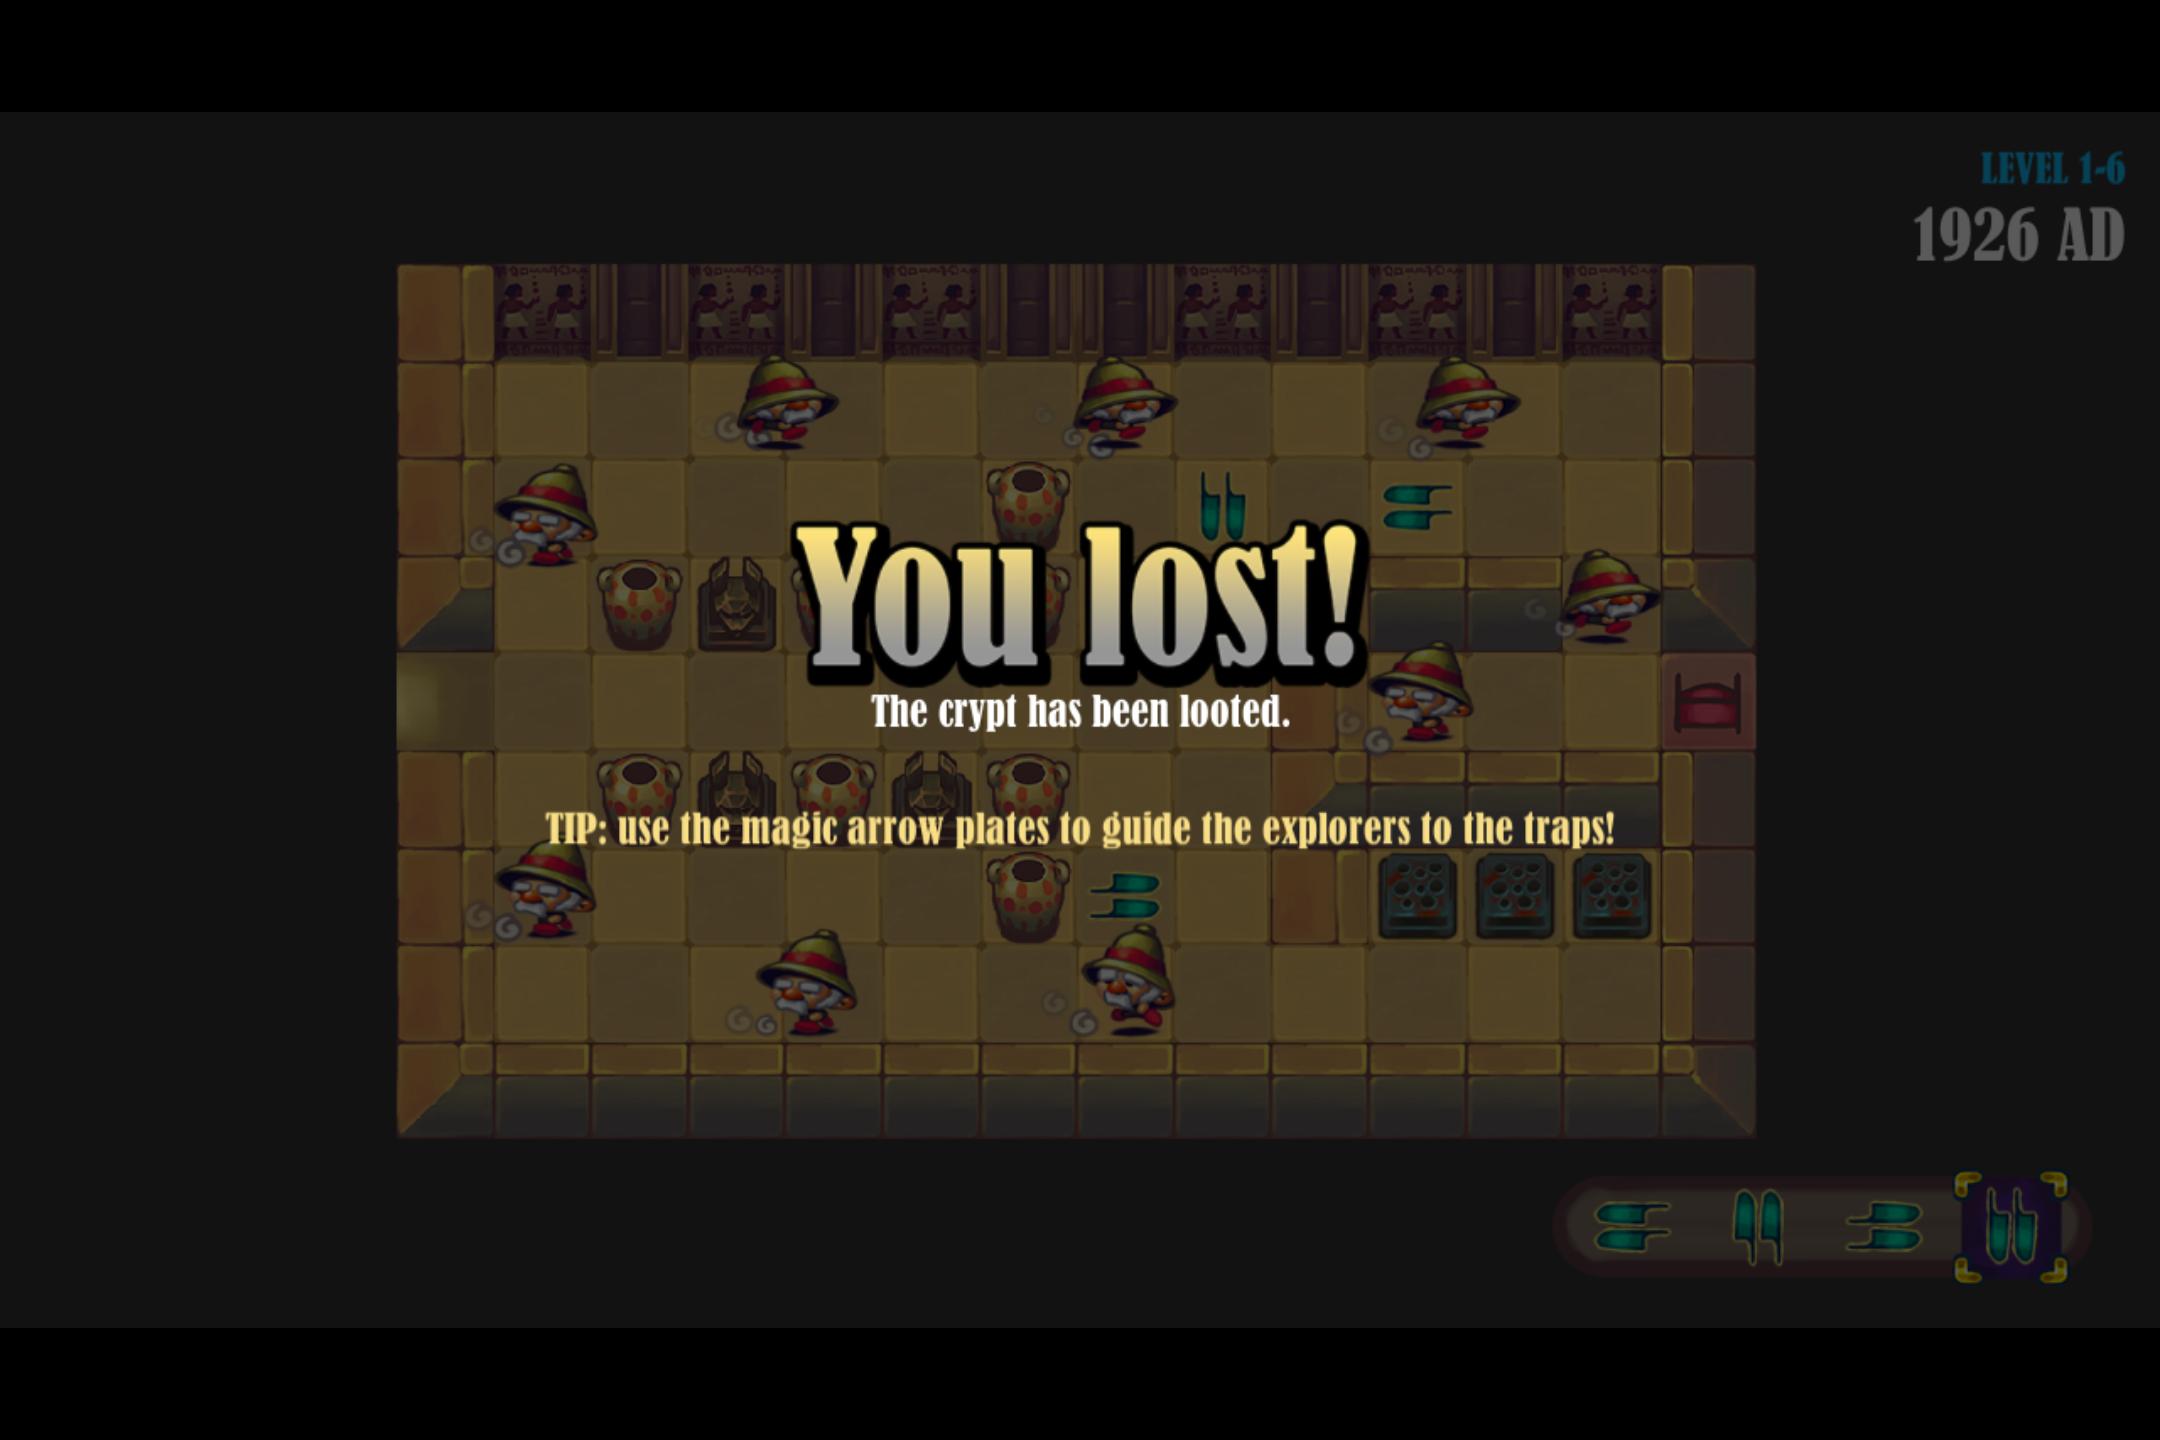 Uncategorized Tutankhamun Game level failed screen image revenge of tutankhamun mod db original